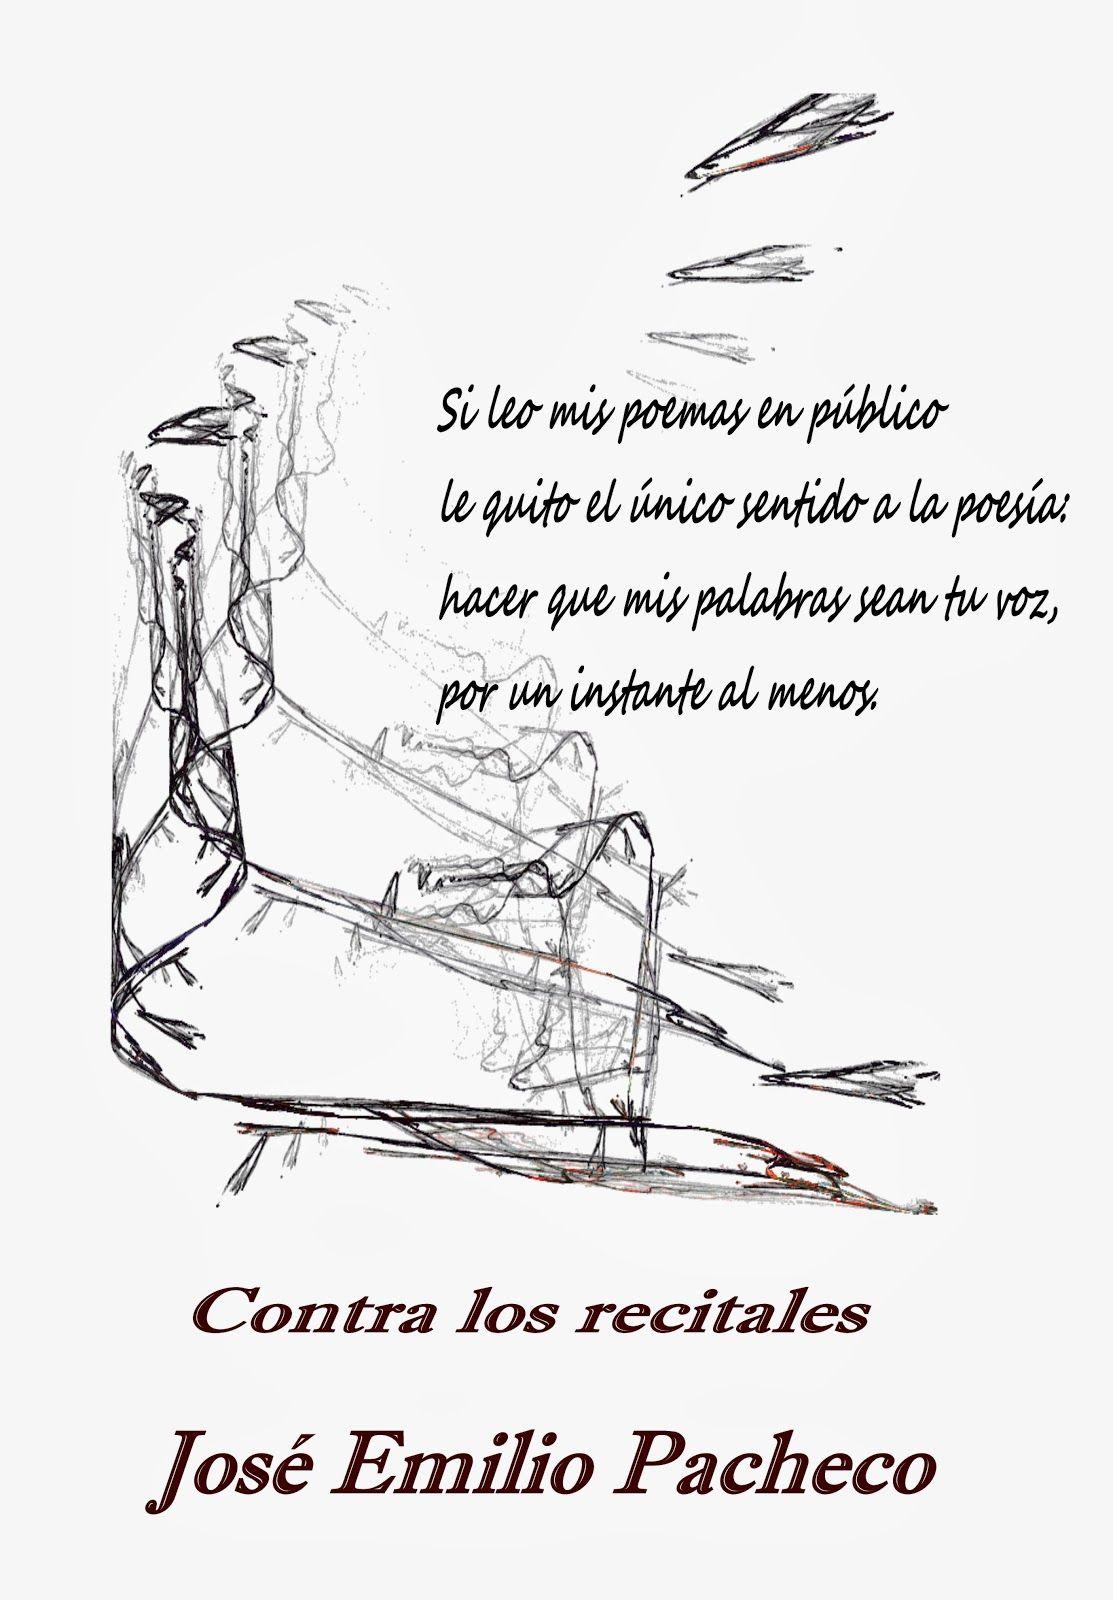 Depapel Poemas Poemas Jose Emilio Pacheco Recital